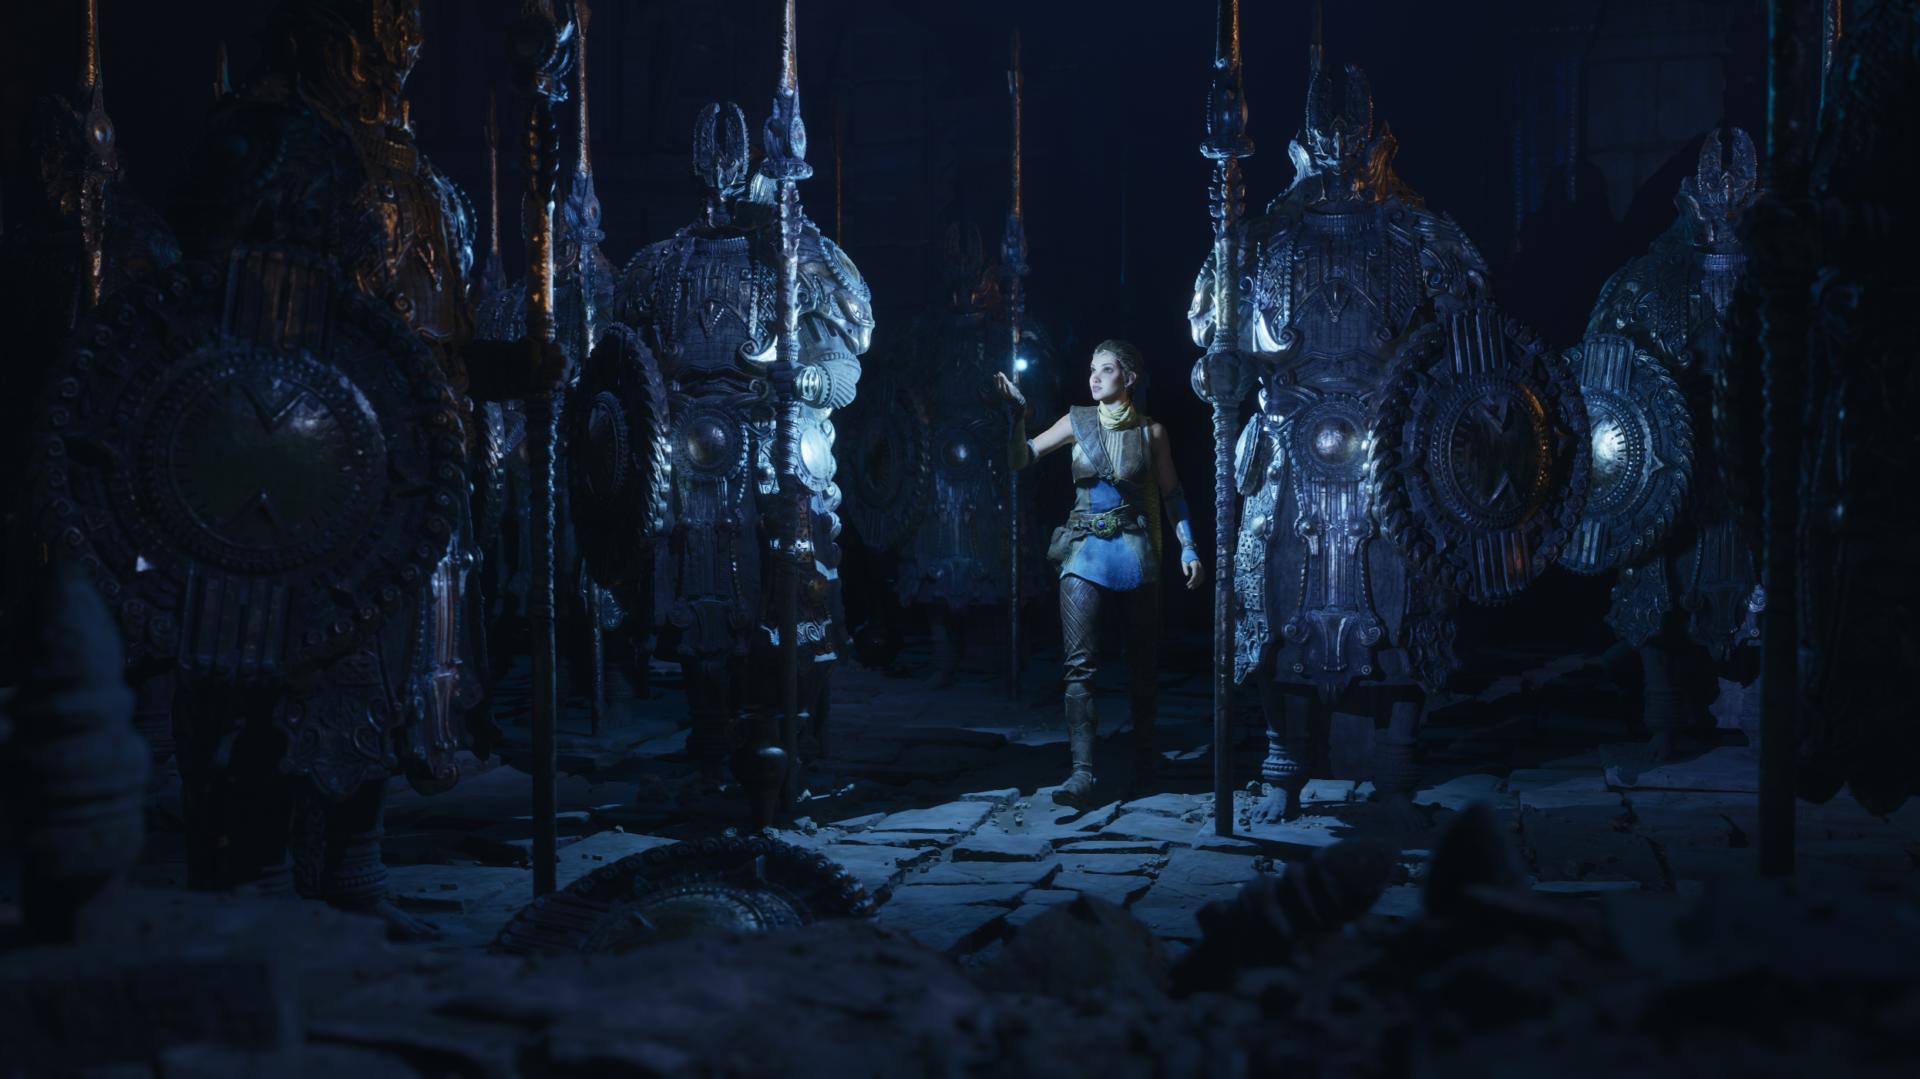 Unreal Engine 5 demo, PS5